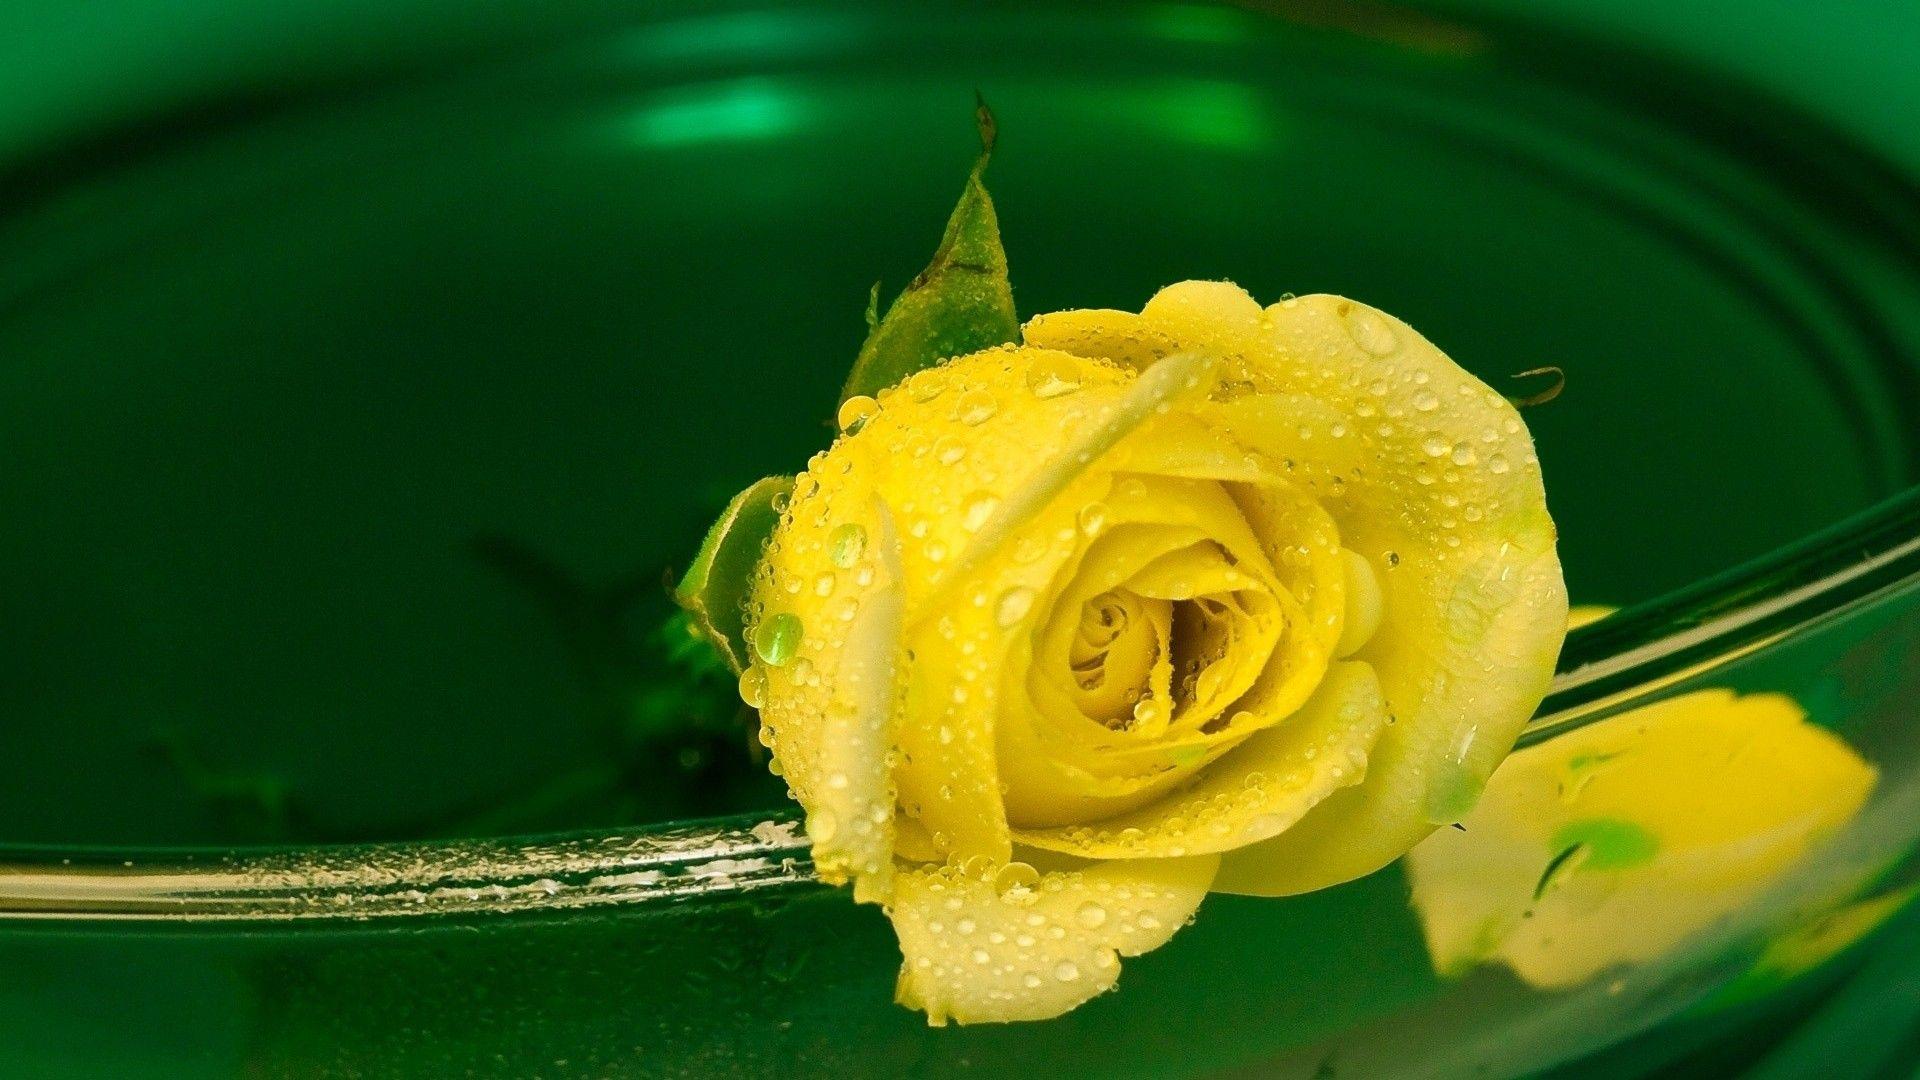 Green and Yellow Desktop Wallpaper Flowers, Yellow roses